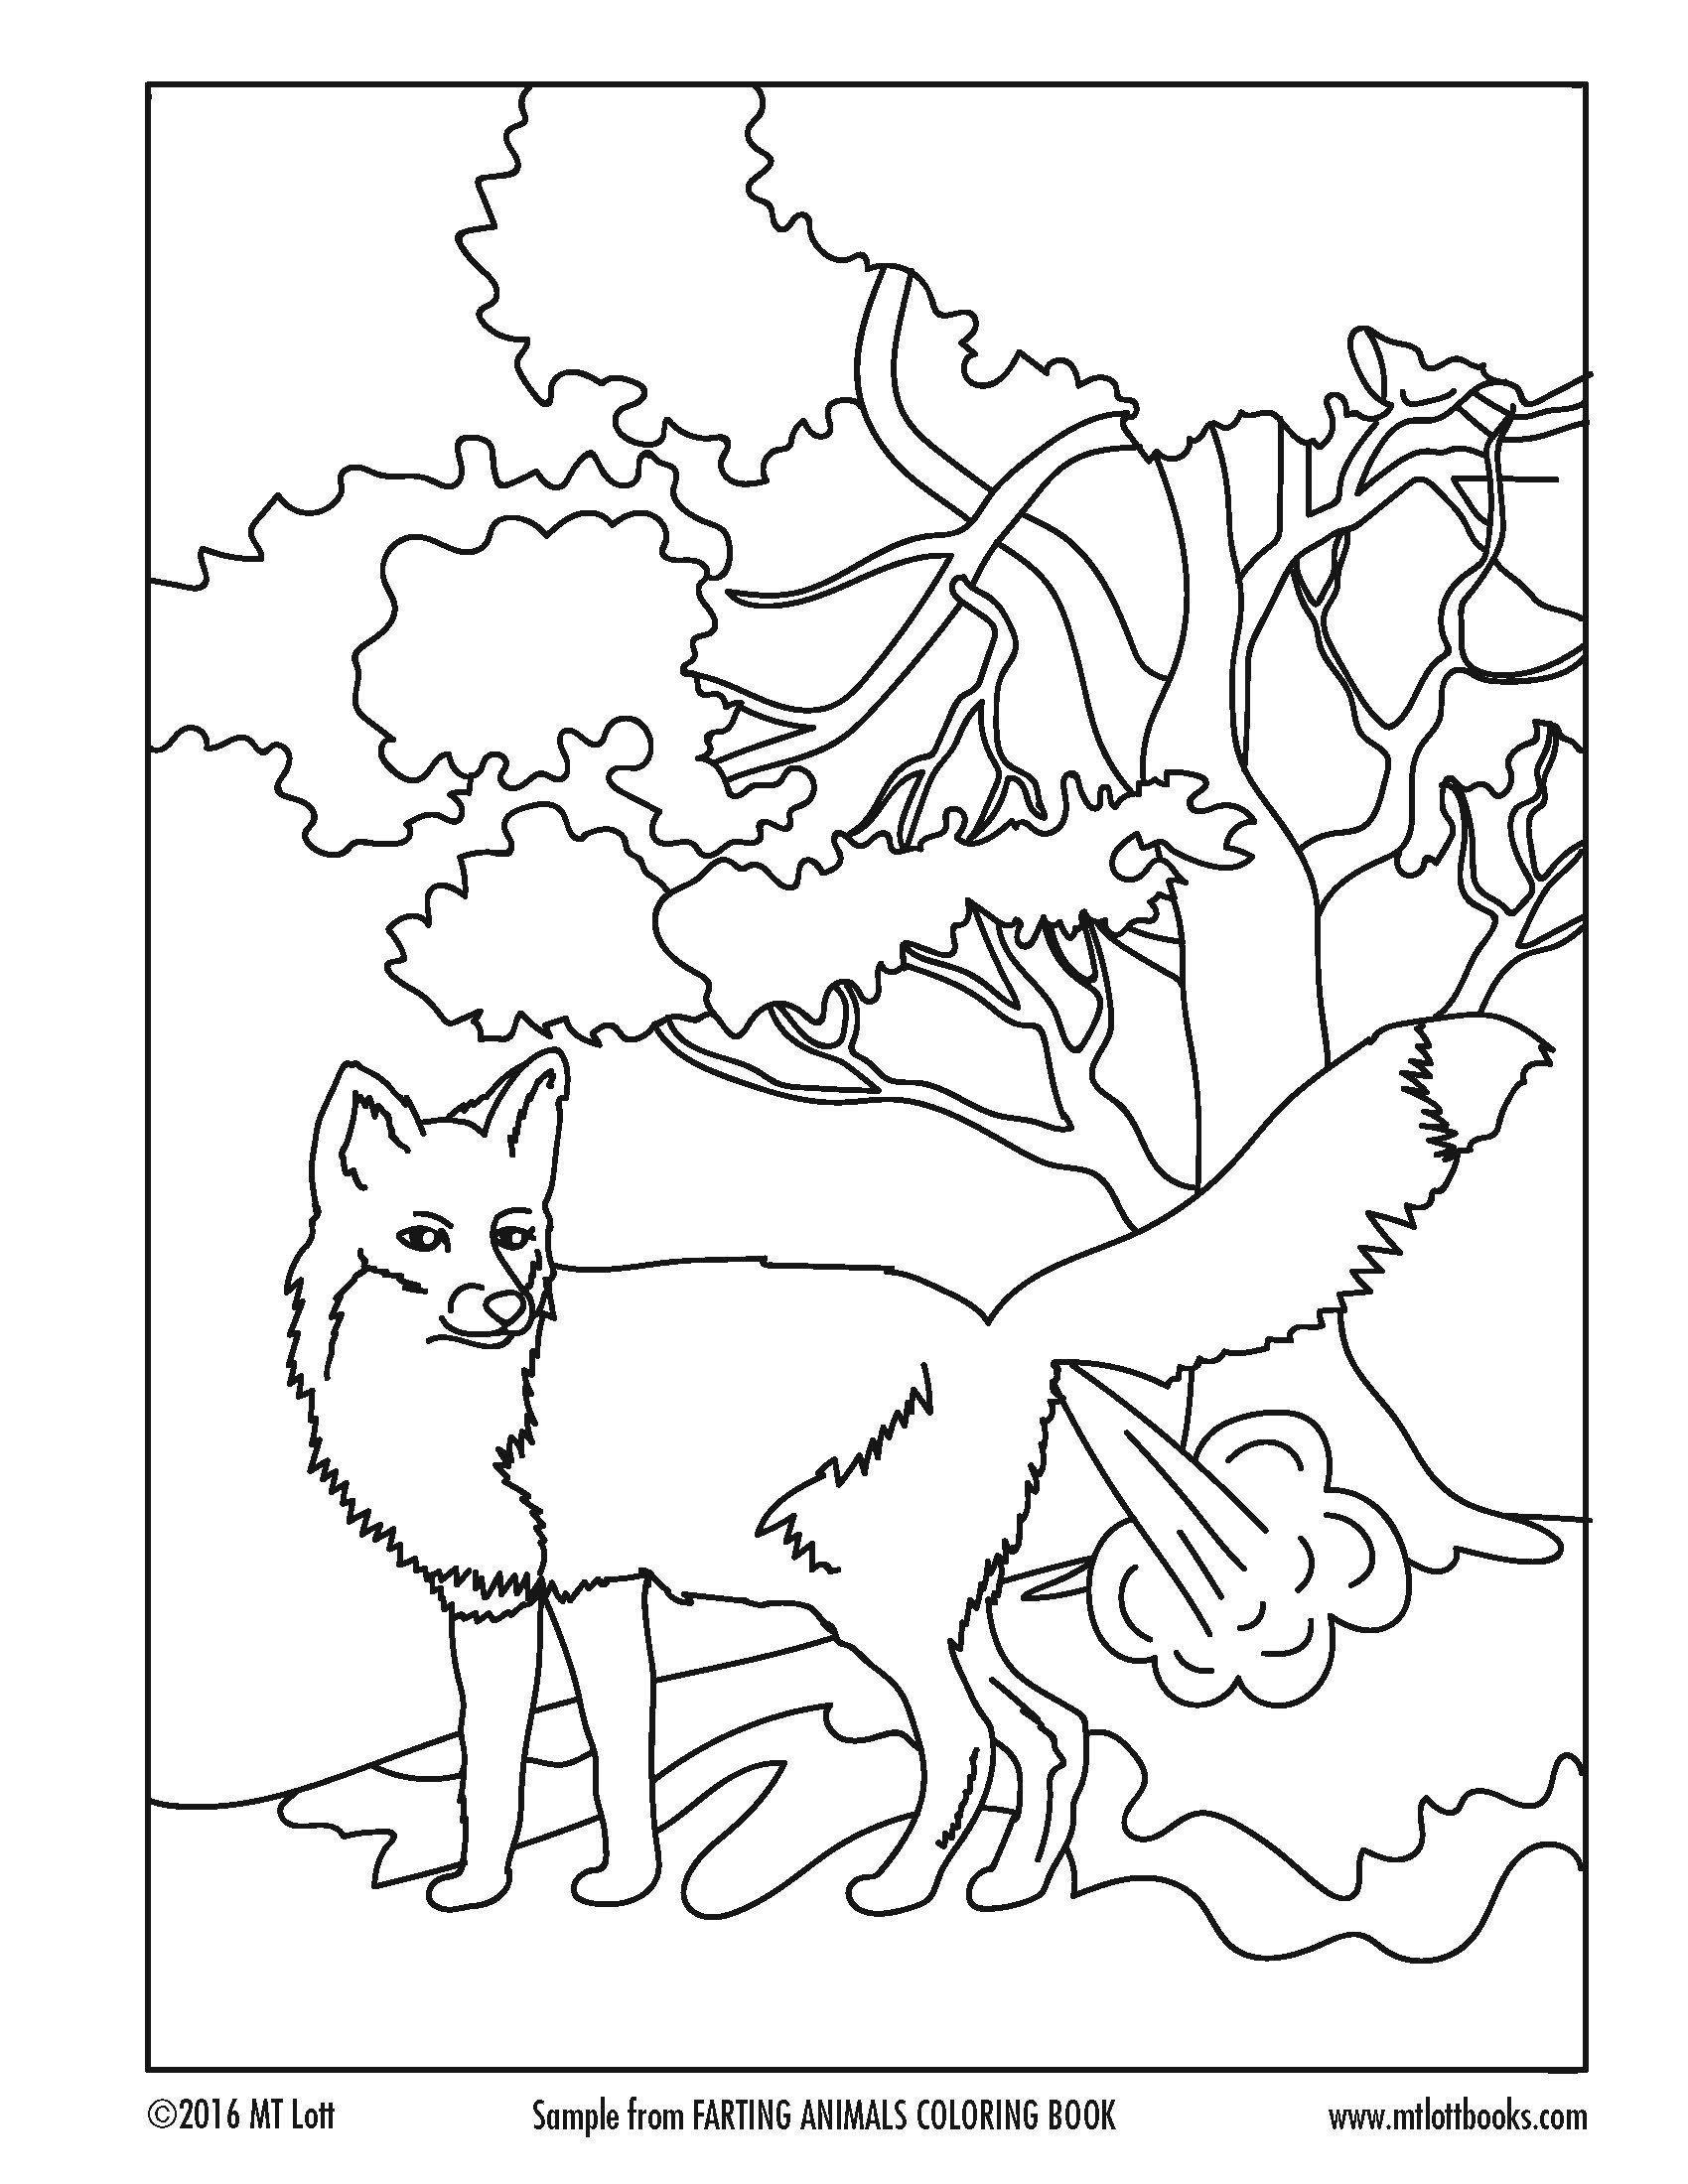 6 Farm Animals Coloring Pages 0f343b2d06aca50af867e034ce84d036 Animal Coloring Pages Farm Animal Coloring Pages Animal Coloring Books [ 2200 x 1700 Pixel ]